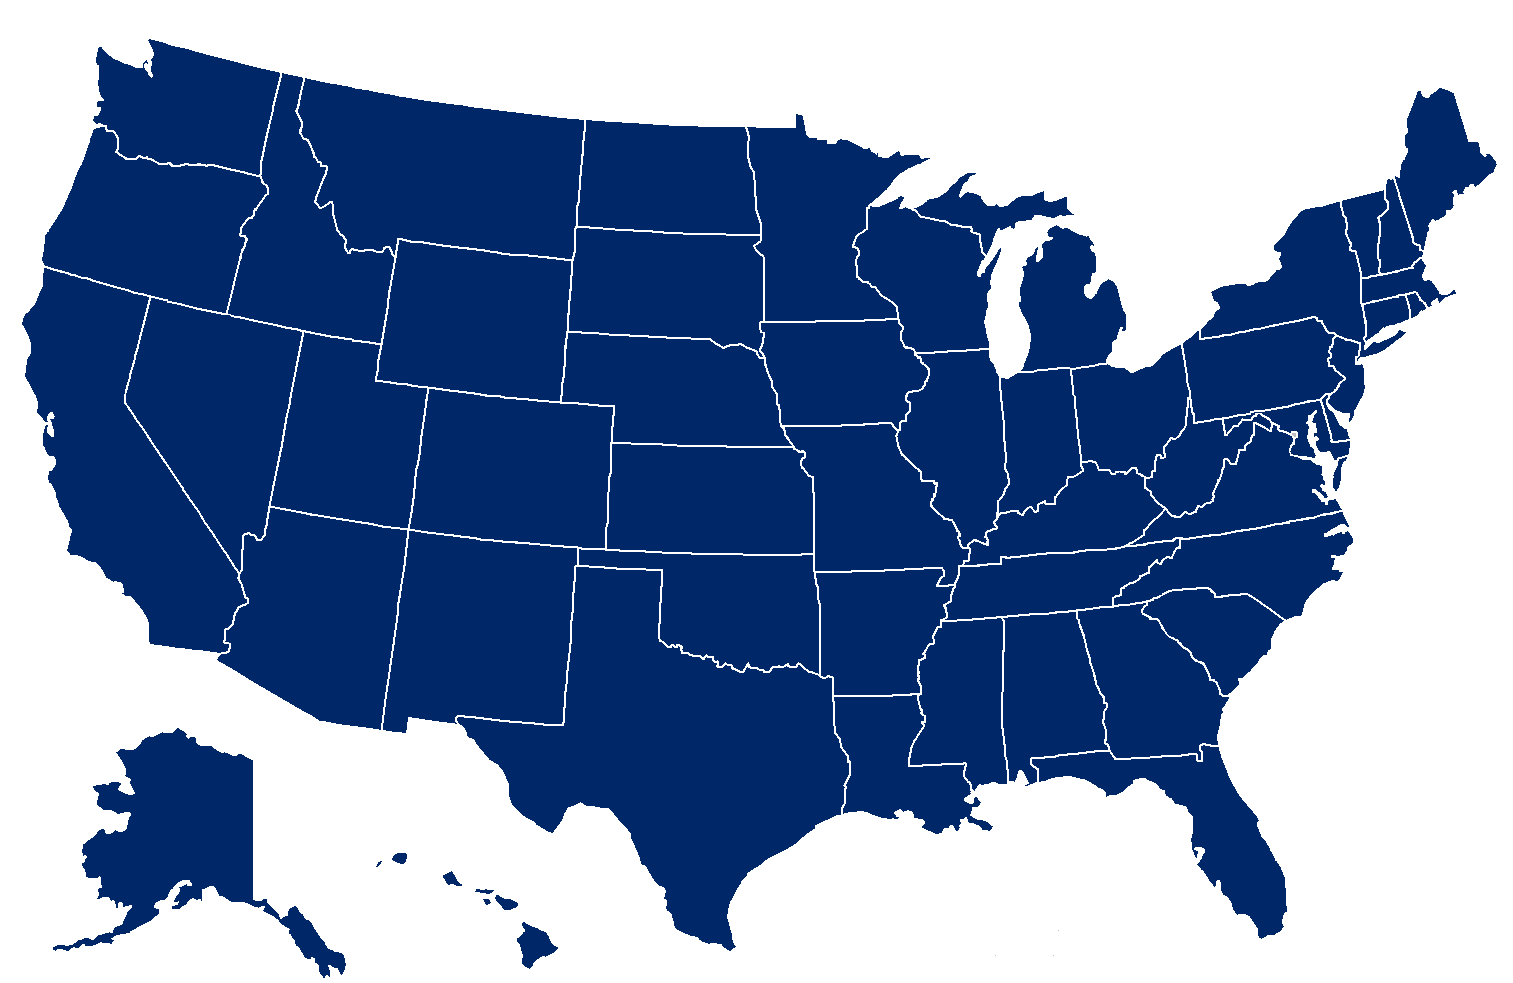 File:USA.